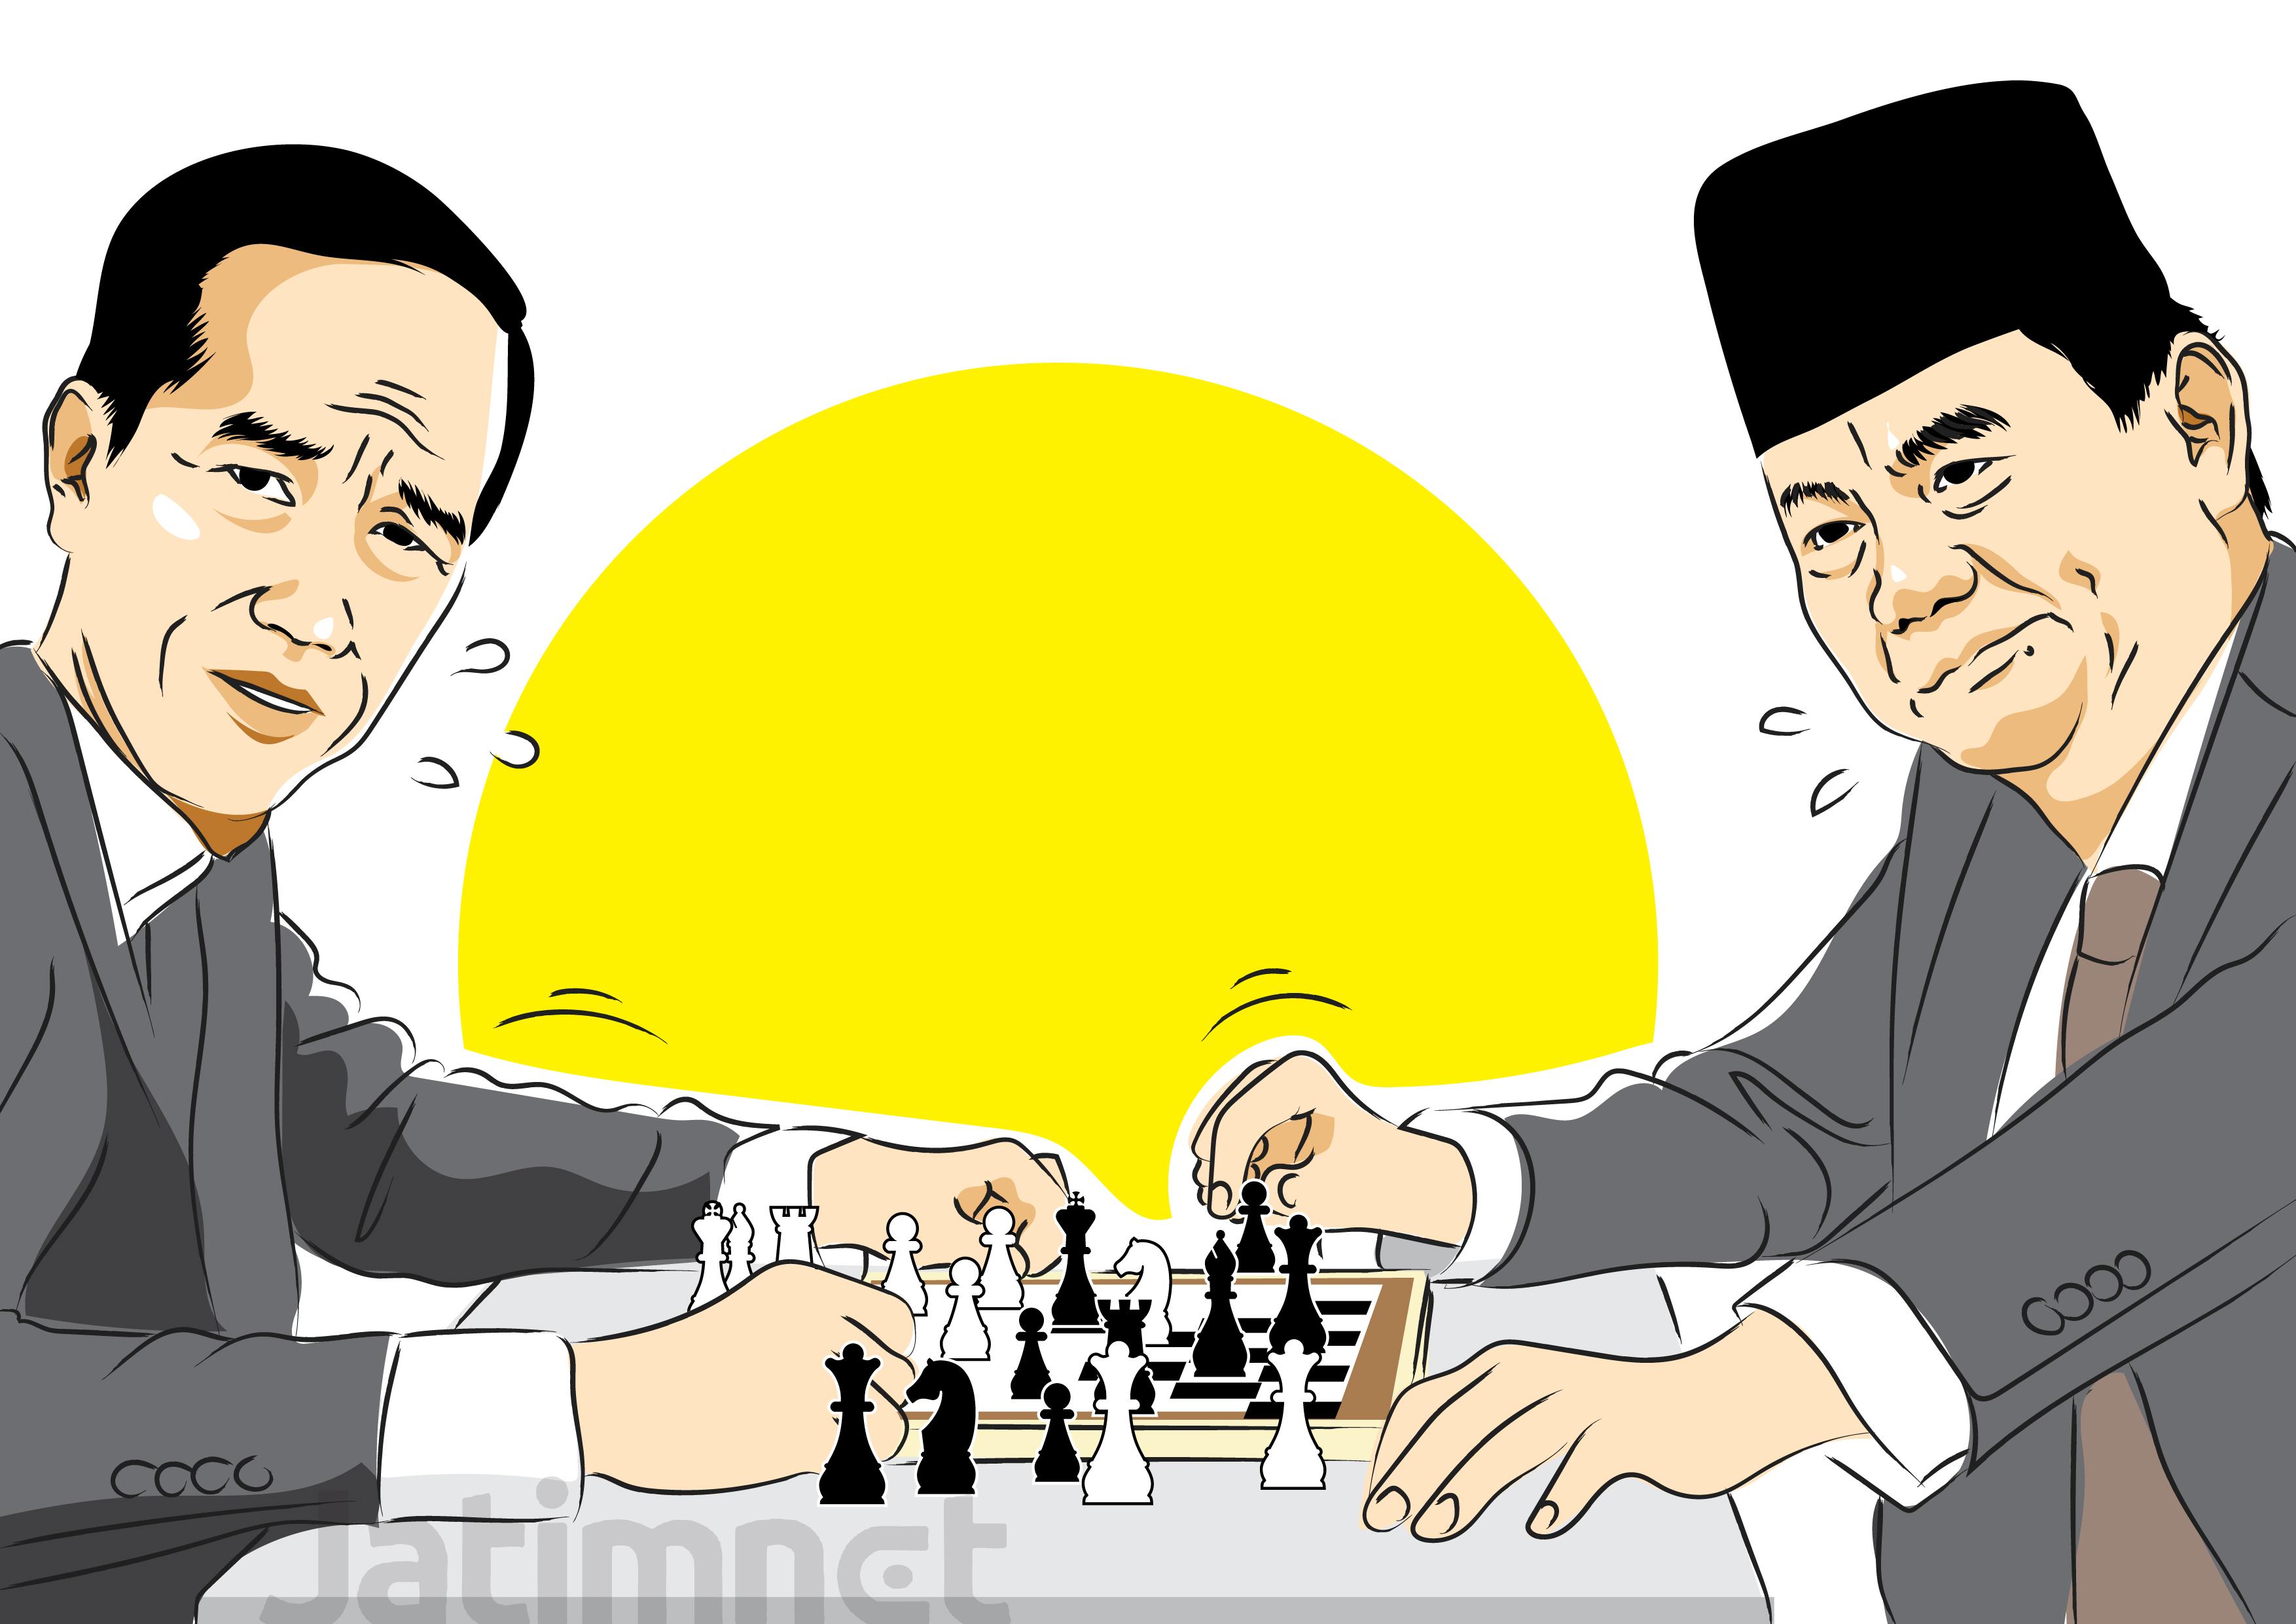 Pengamat: NU dan Gusdurian Dongkrak Suara Jokowi di Jatim